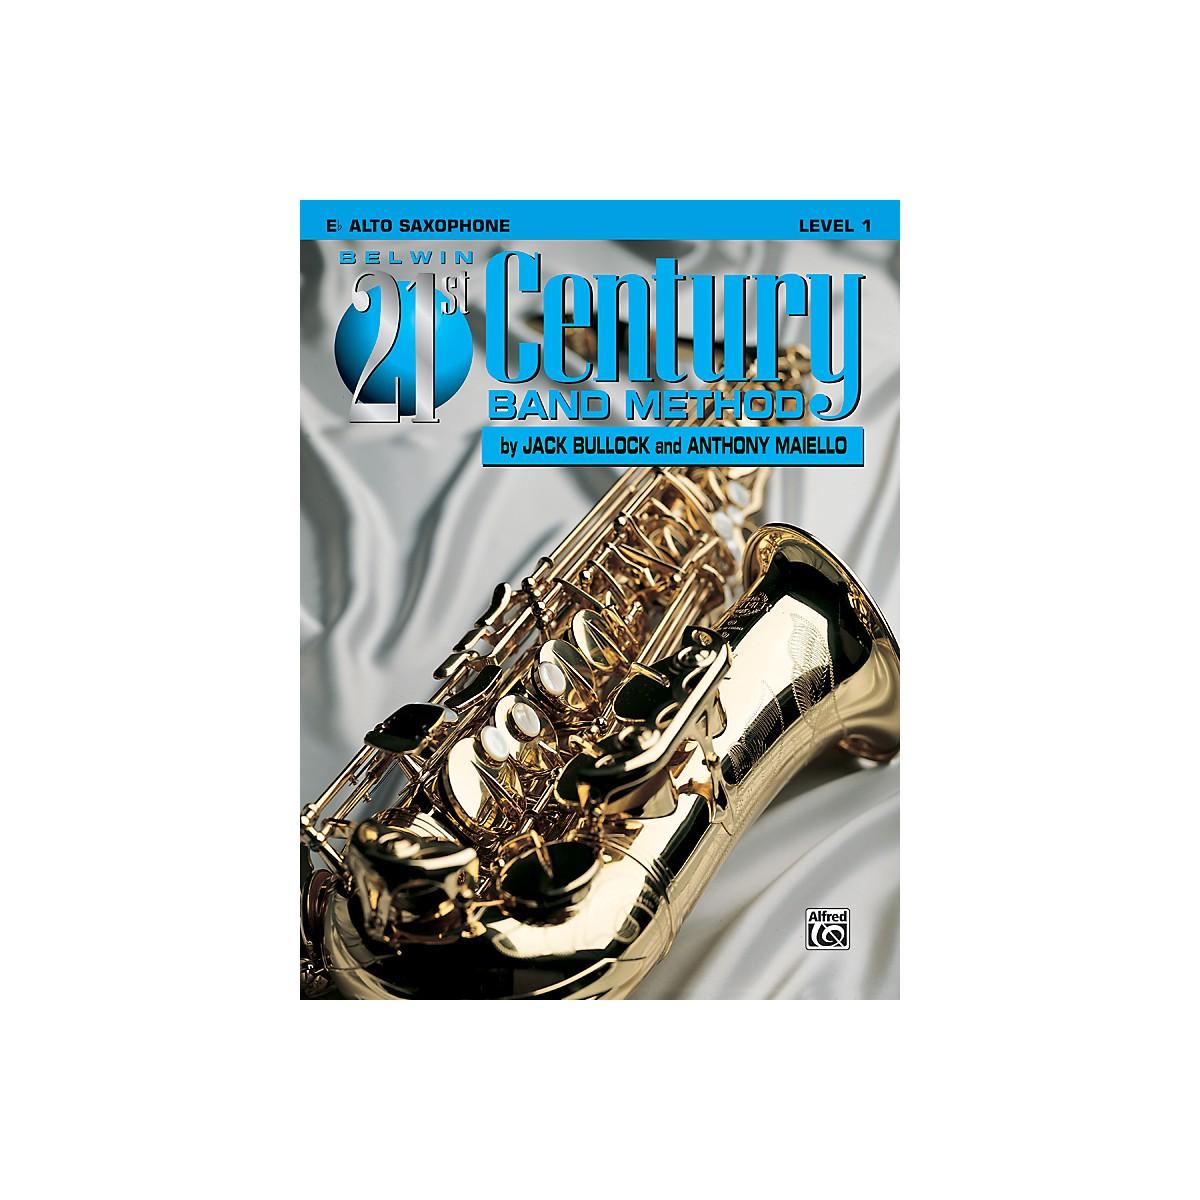 Alfred Belwin 21st Century Band Method Level 1 E-Flat Alto Saxophone Book